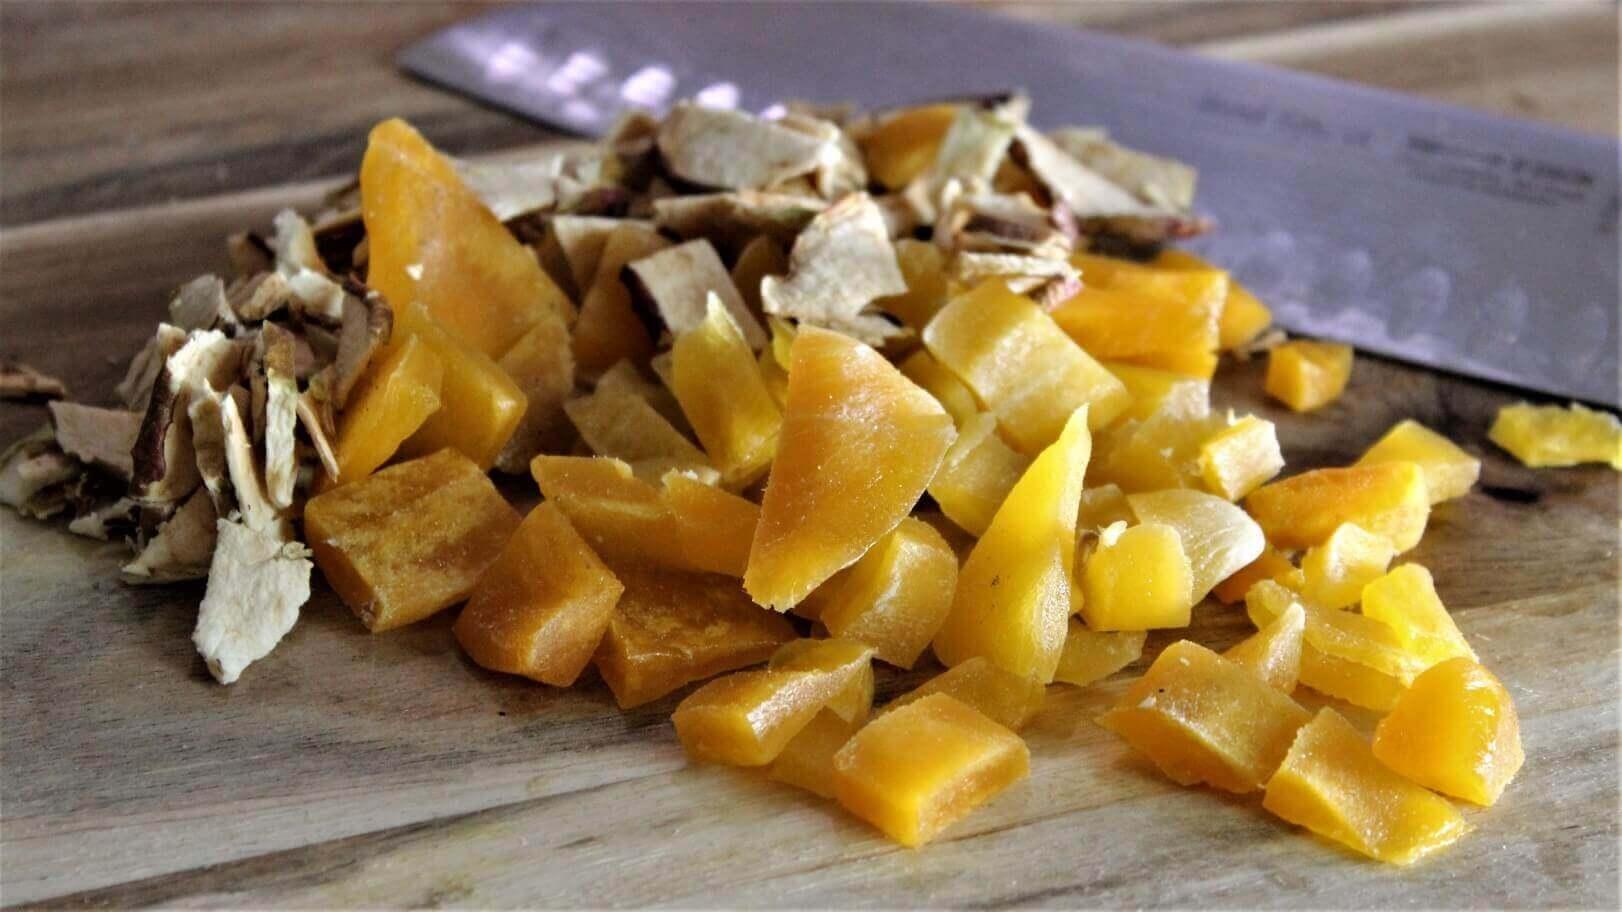 Warmer Chicoree Salat Mango und Apfel aufschneiden chicoree salat_Gehackte Mango und Apfelscheiben